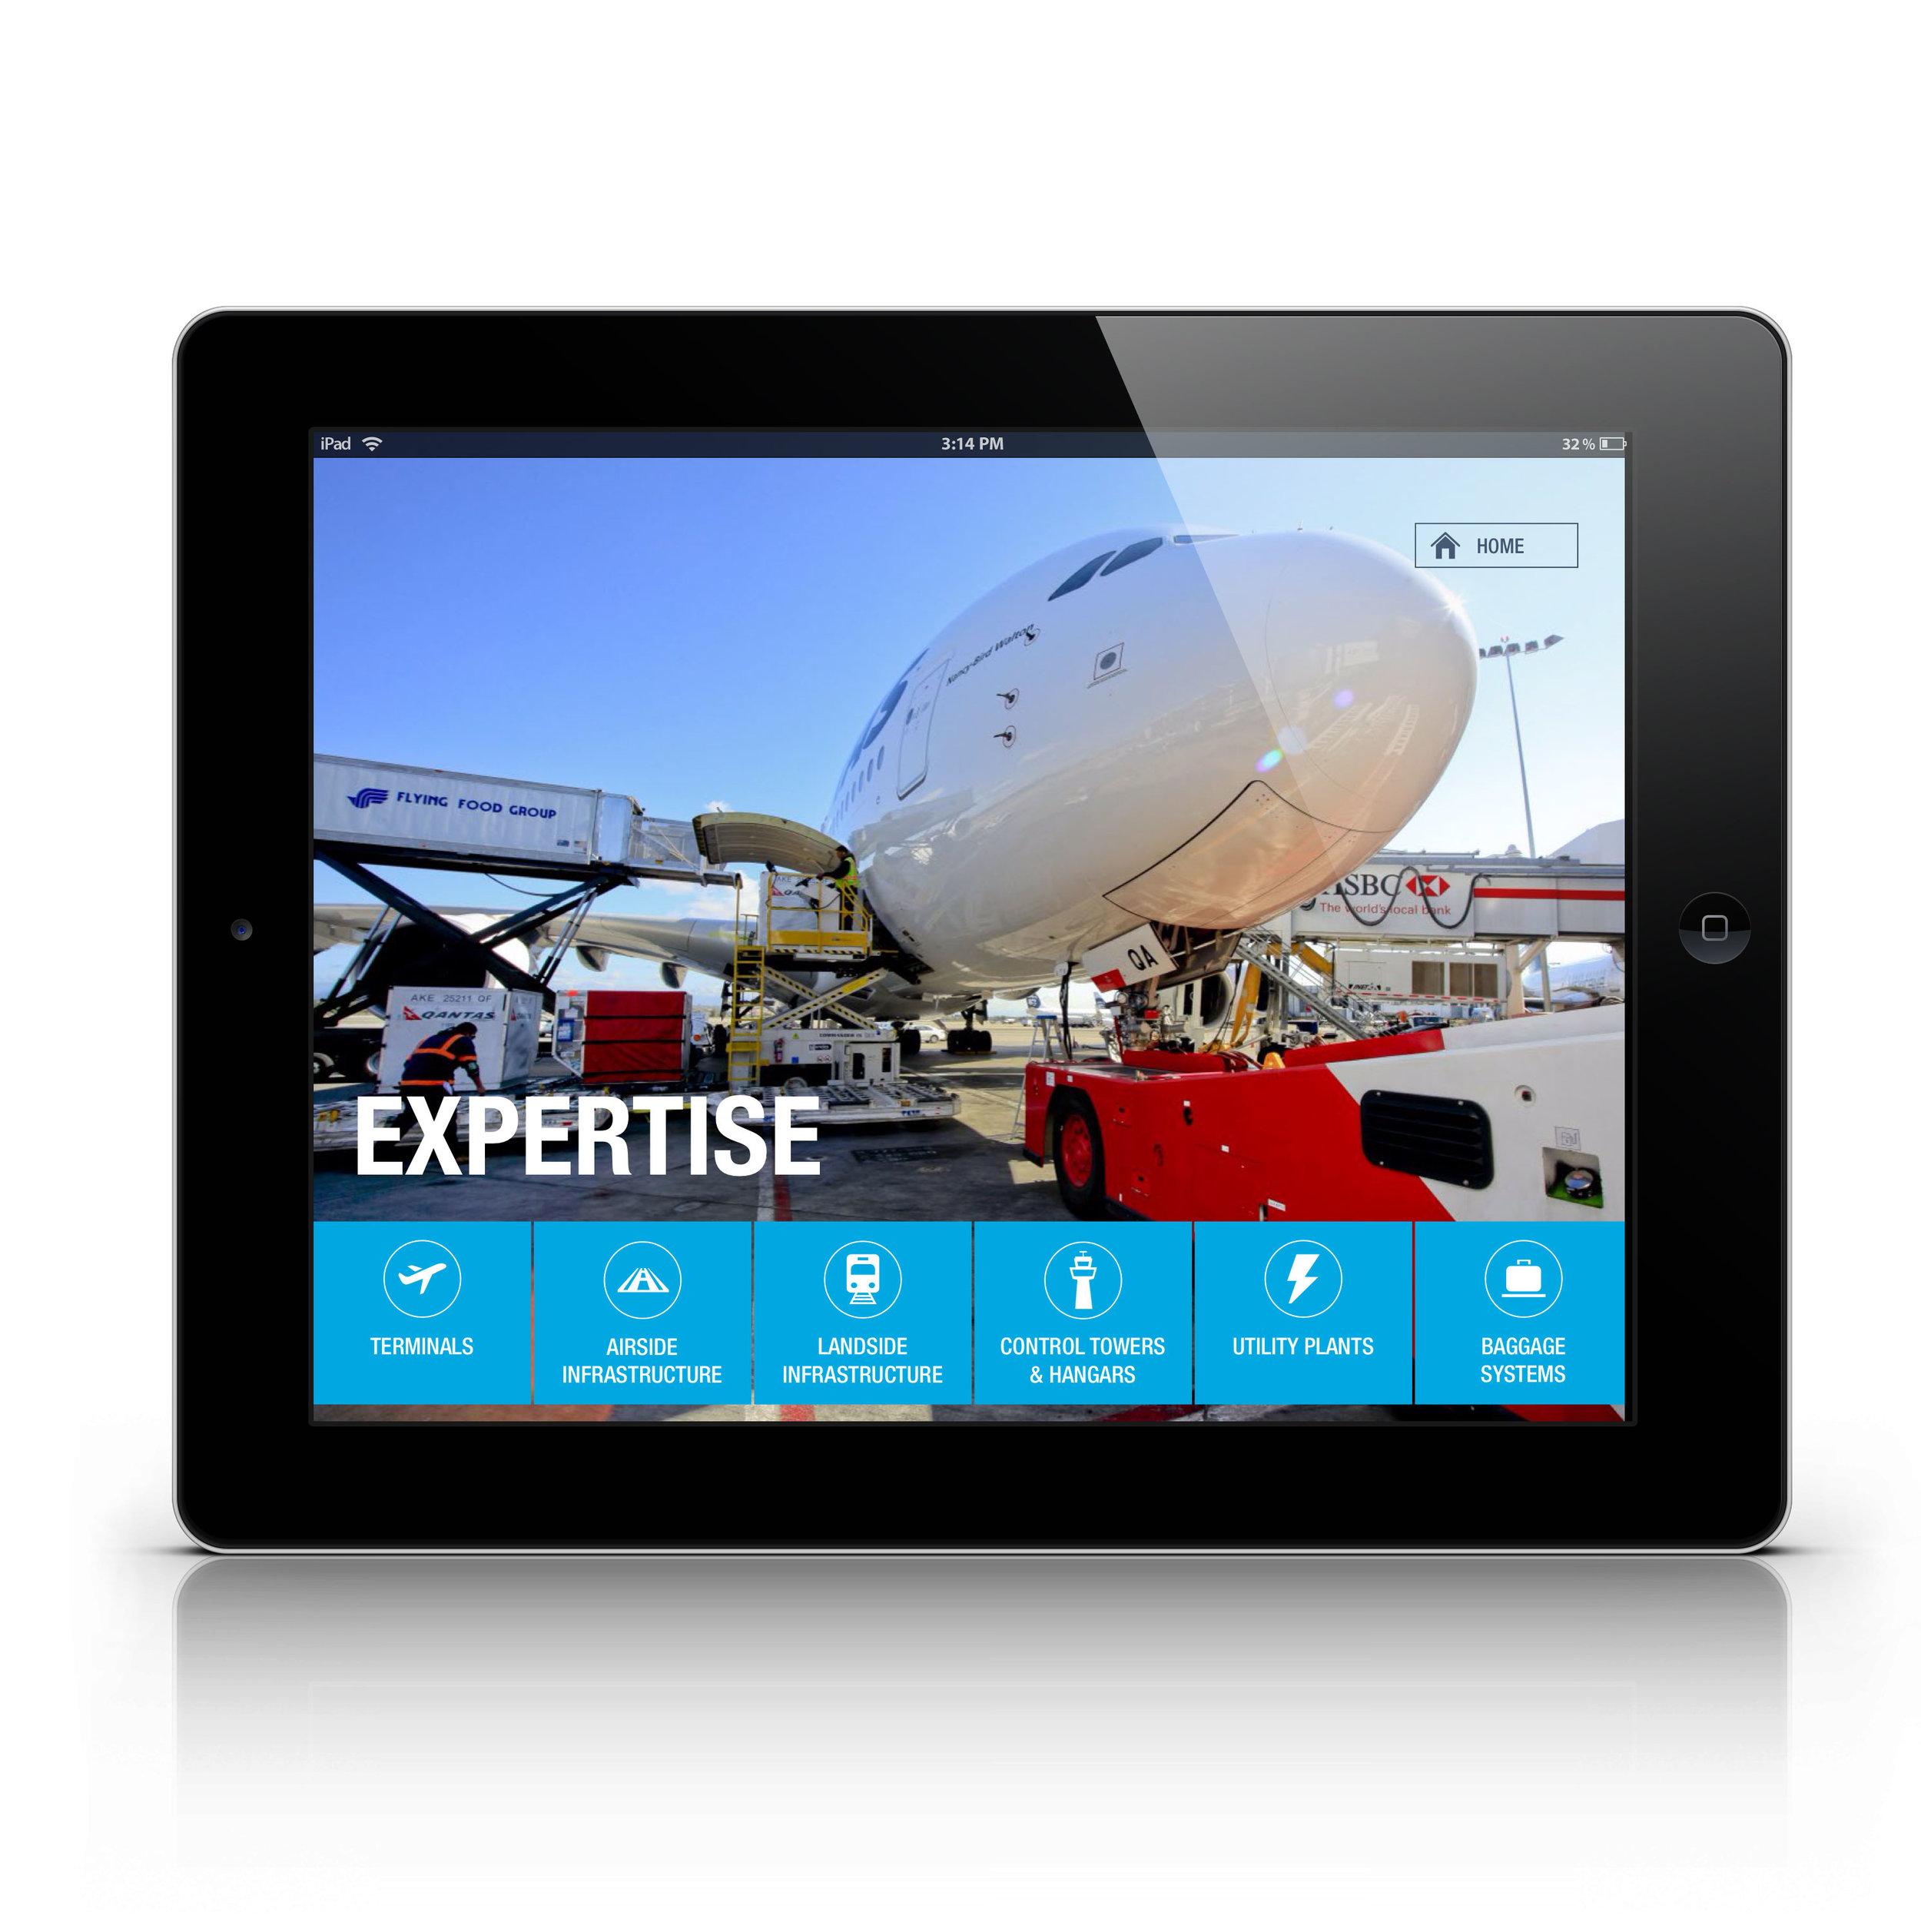 4clark-iPad-Landscape-Retina-Display-Mockup.jpg